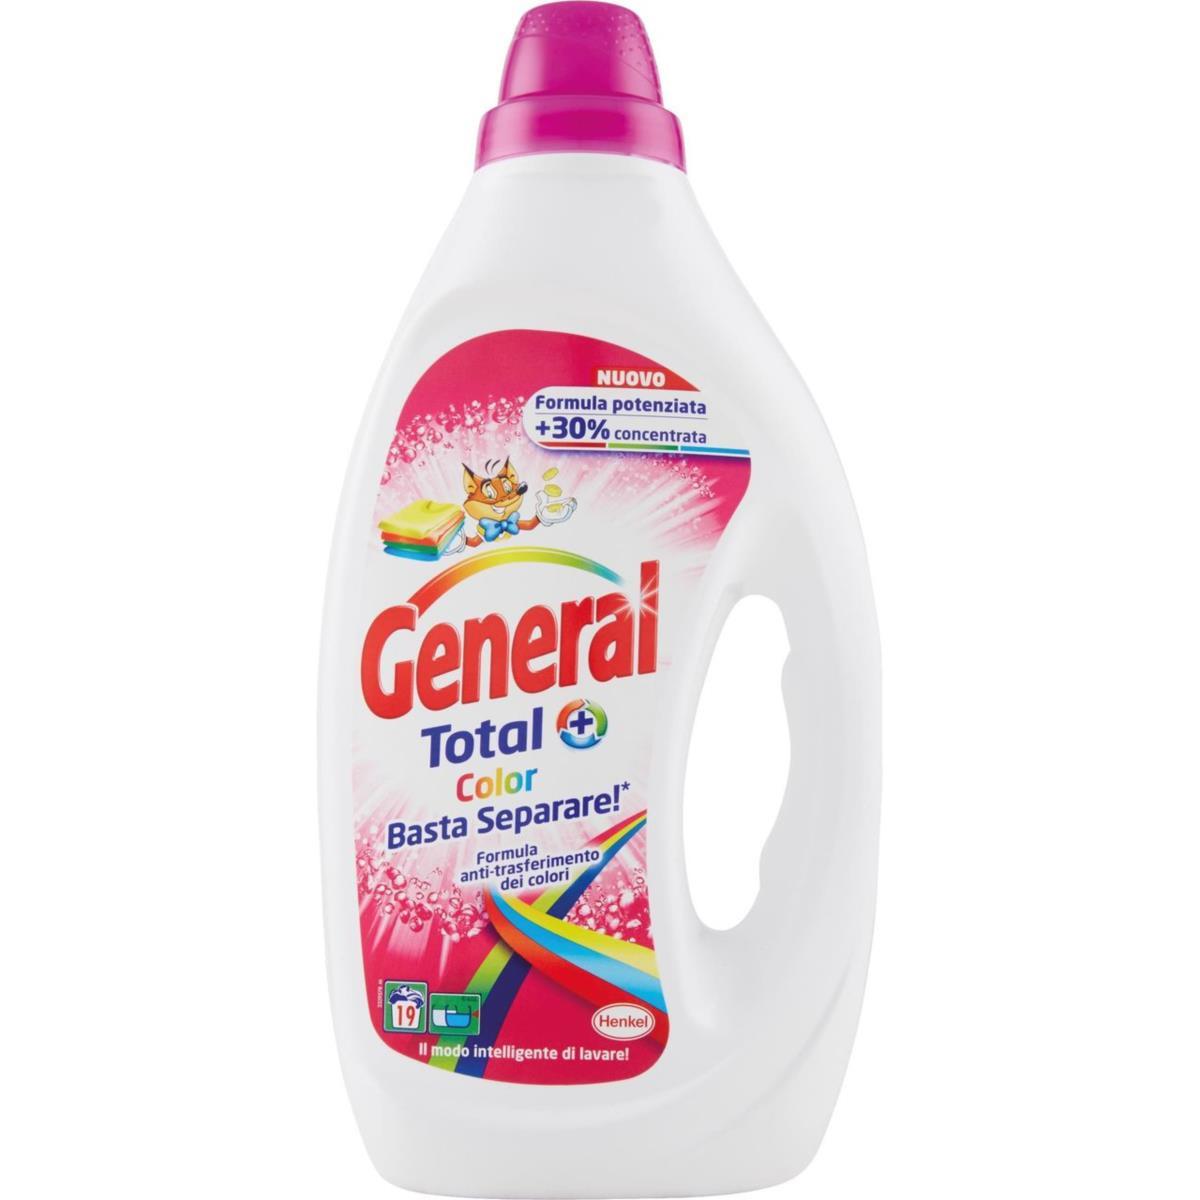 General Color 19 lavaggi